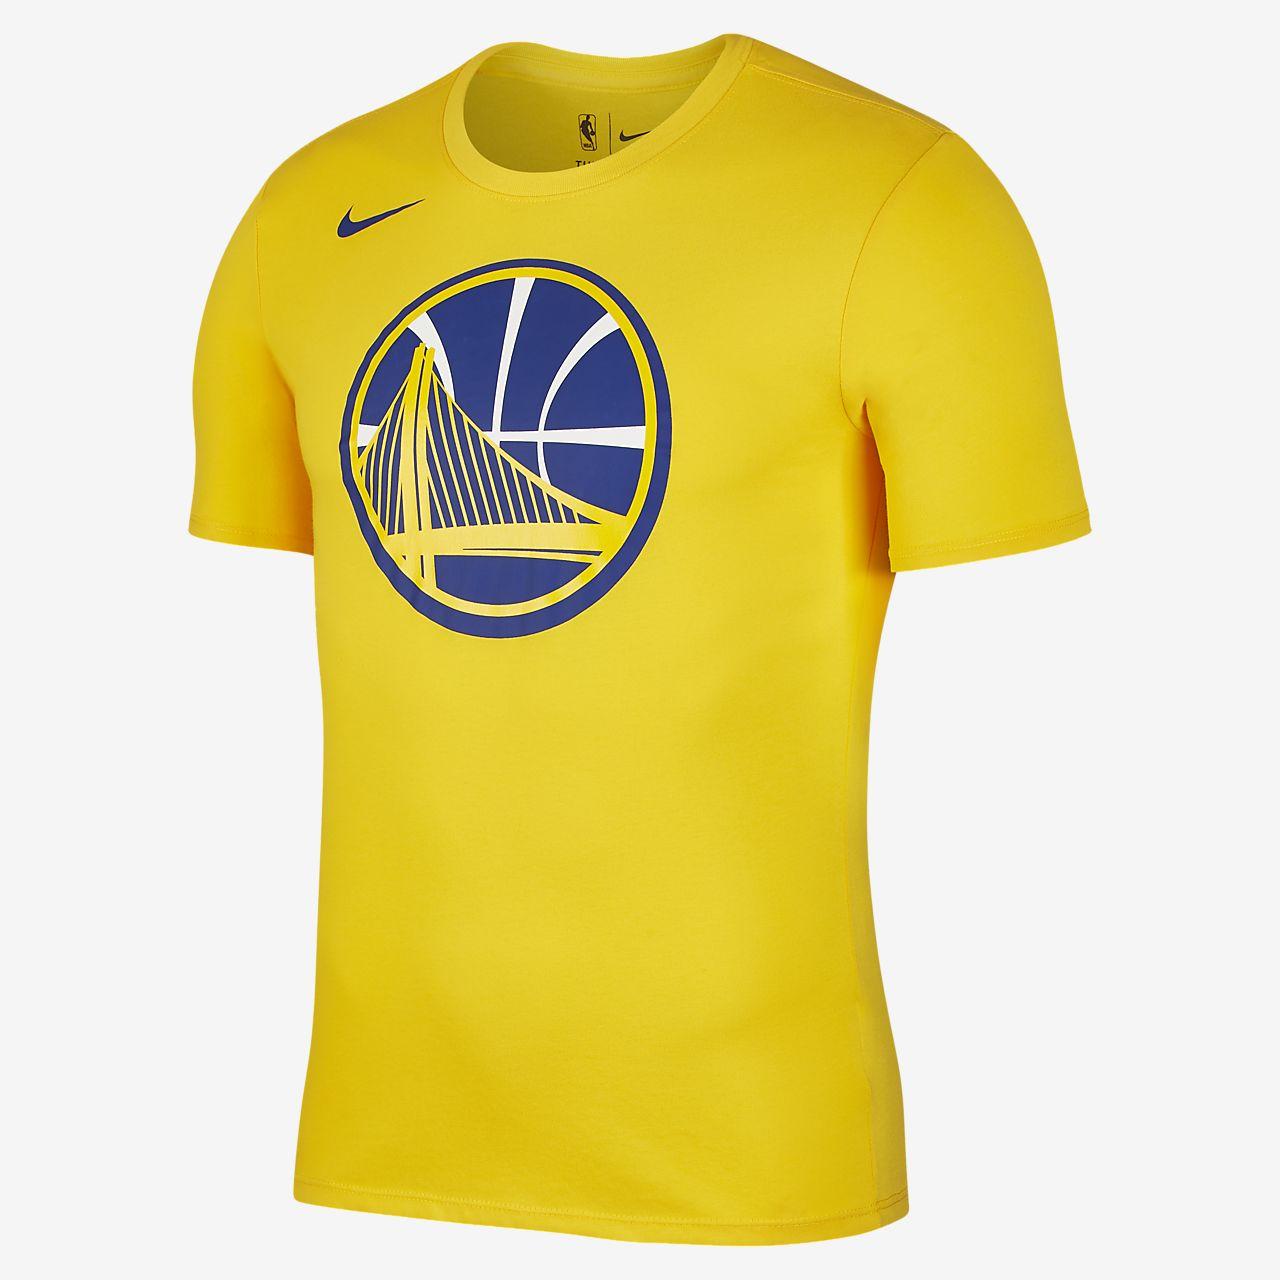 golden state warriors nike dry logo men s nba t shirt nike com rh nike com nike basketball t-shirt sayings nike basketball t shirts india